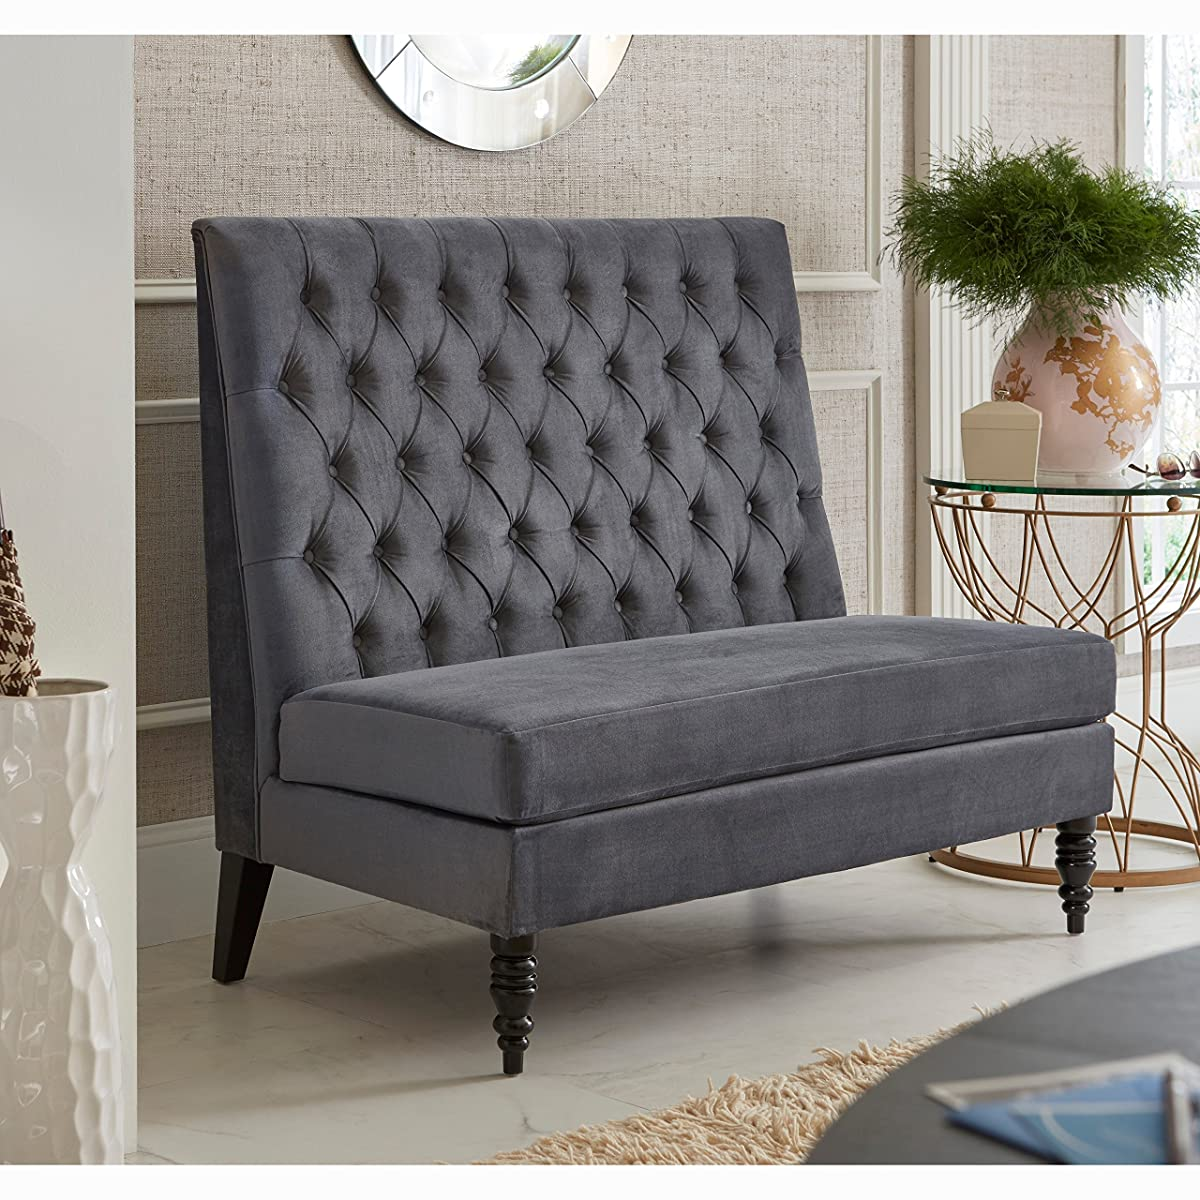 Sofaweb Silver Grey Velvet Tufted Upholstered Banquette Bench